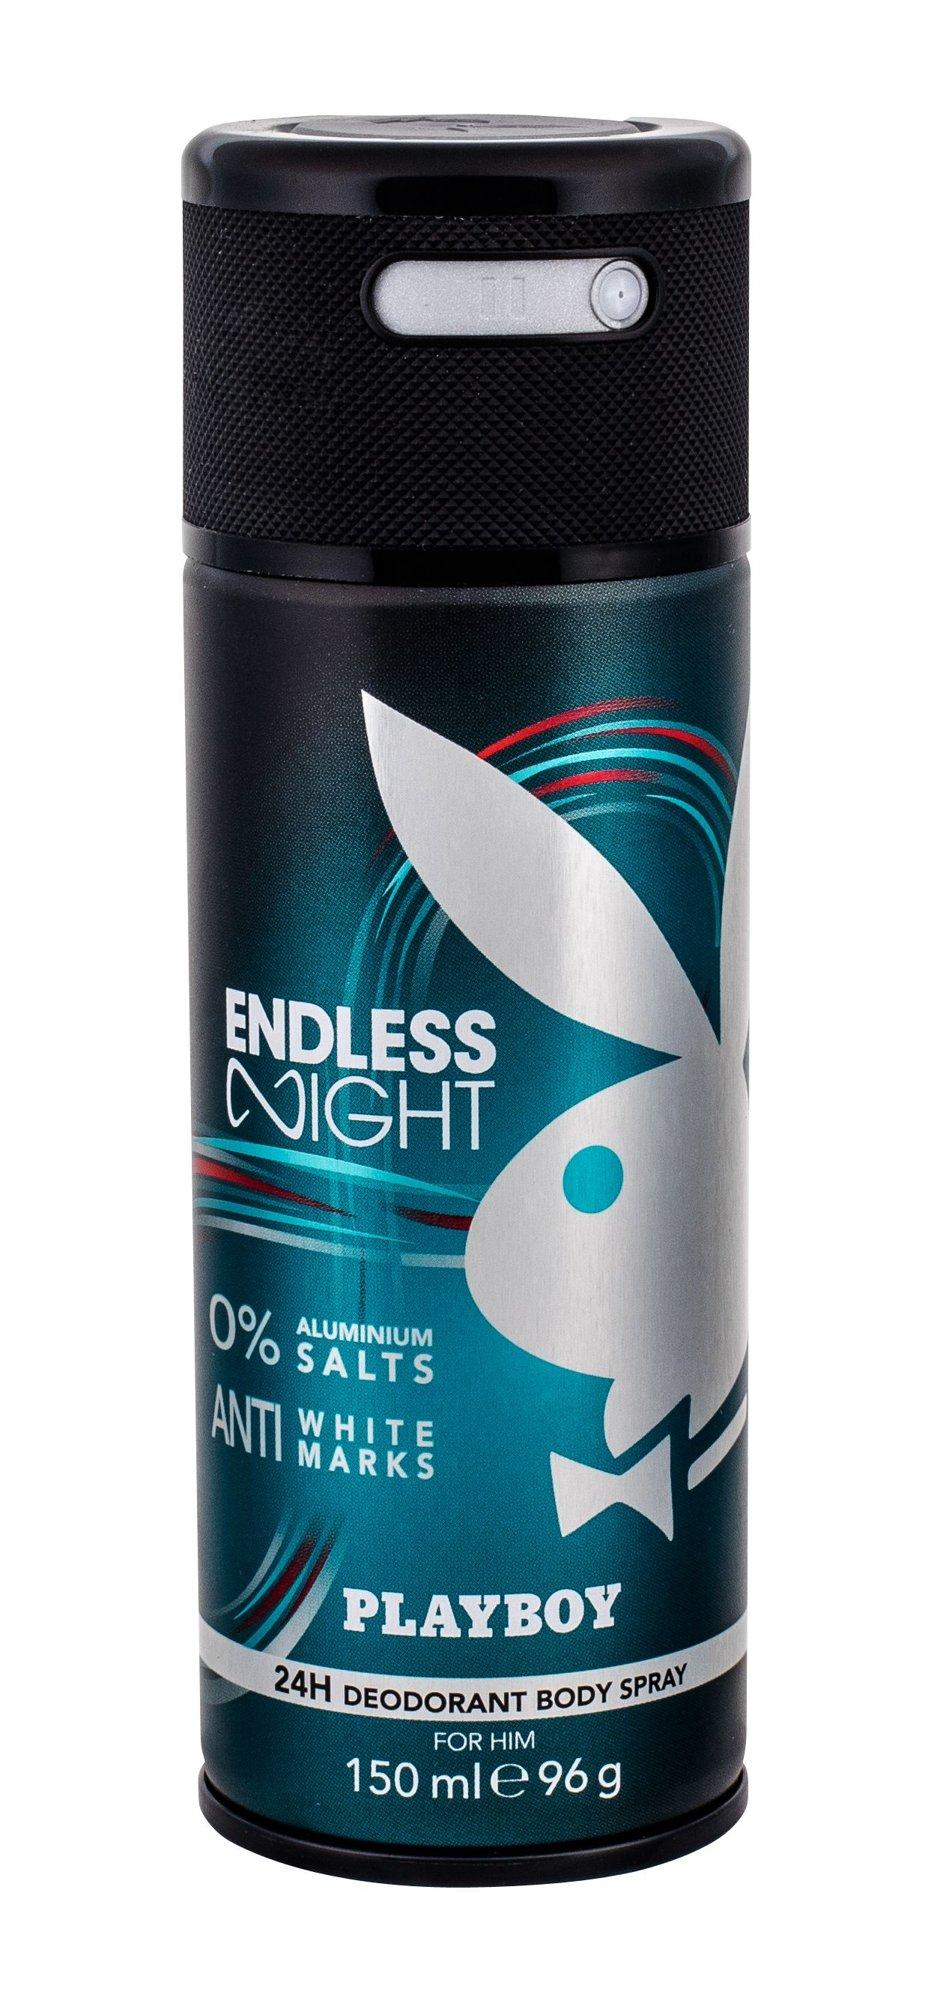 Playboy Endless Night Deodorant 150ml